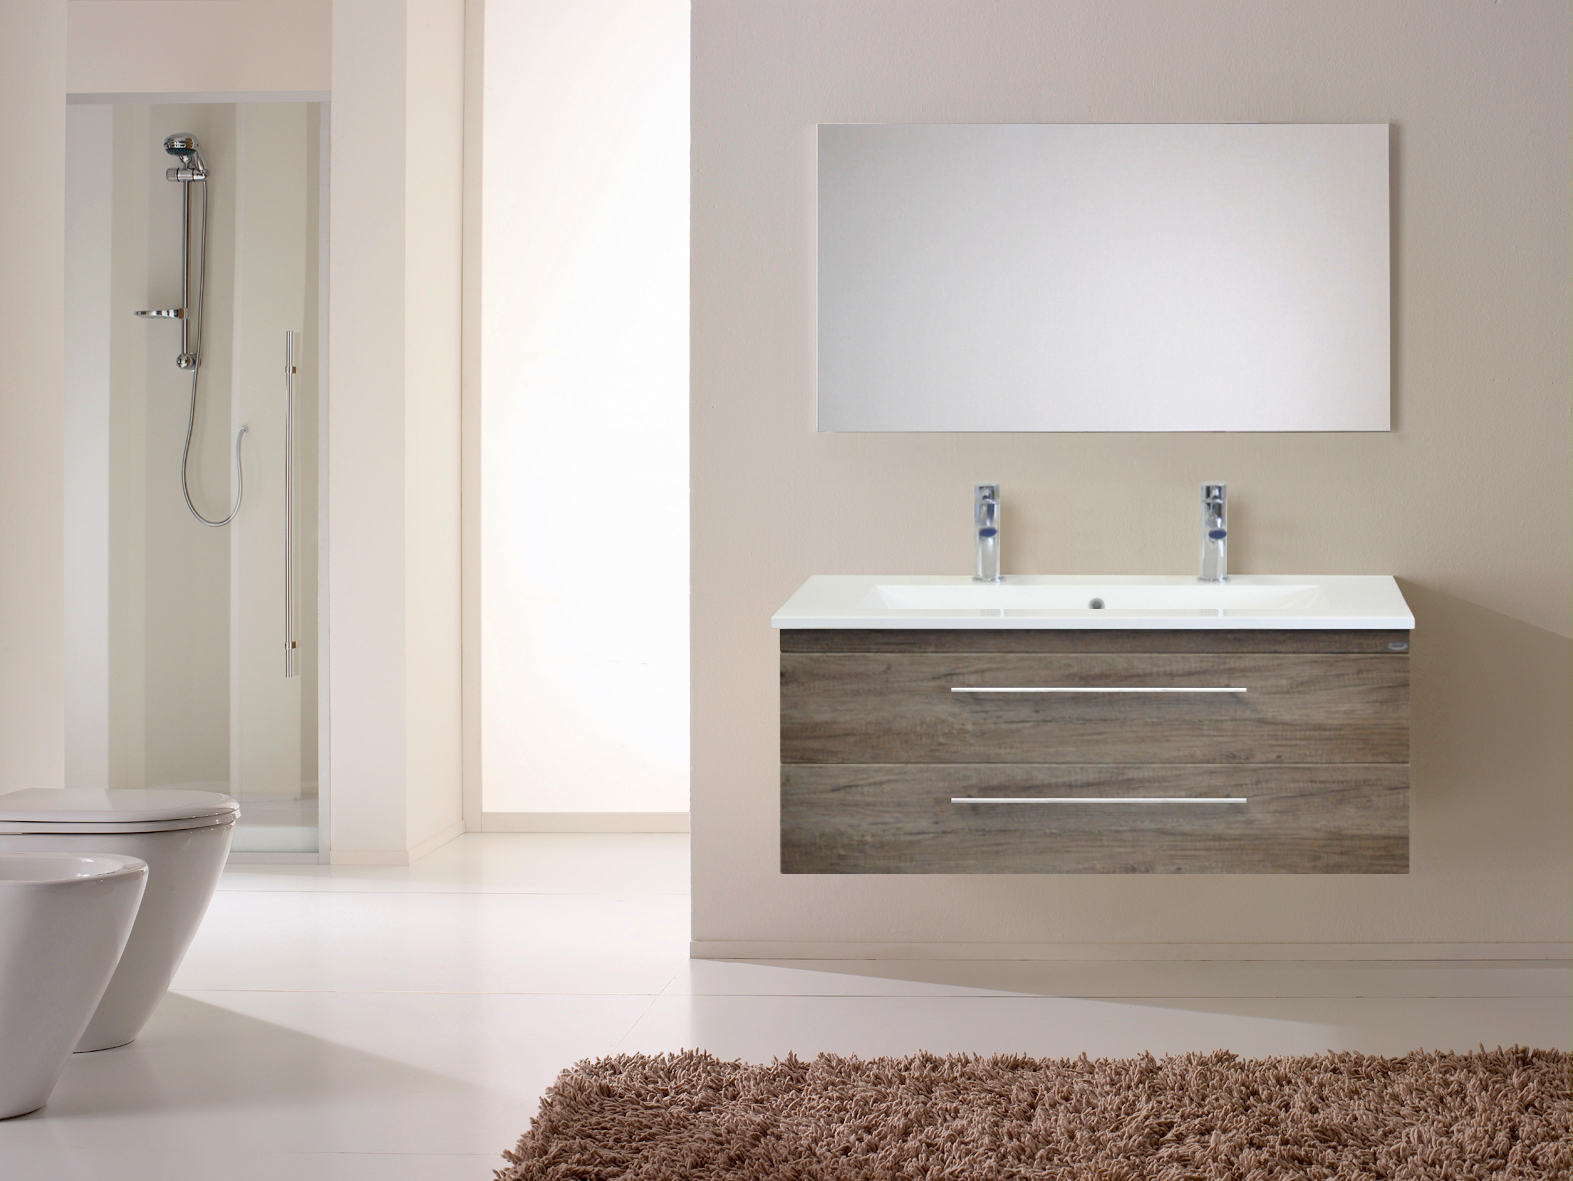 Badkamermeubelset Sanicare Q15 2 Laden Truffel (spiegel optioneel)